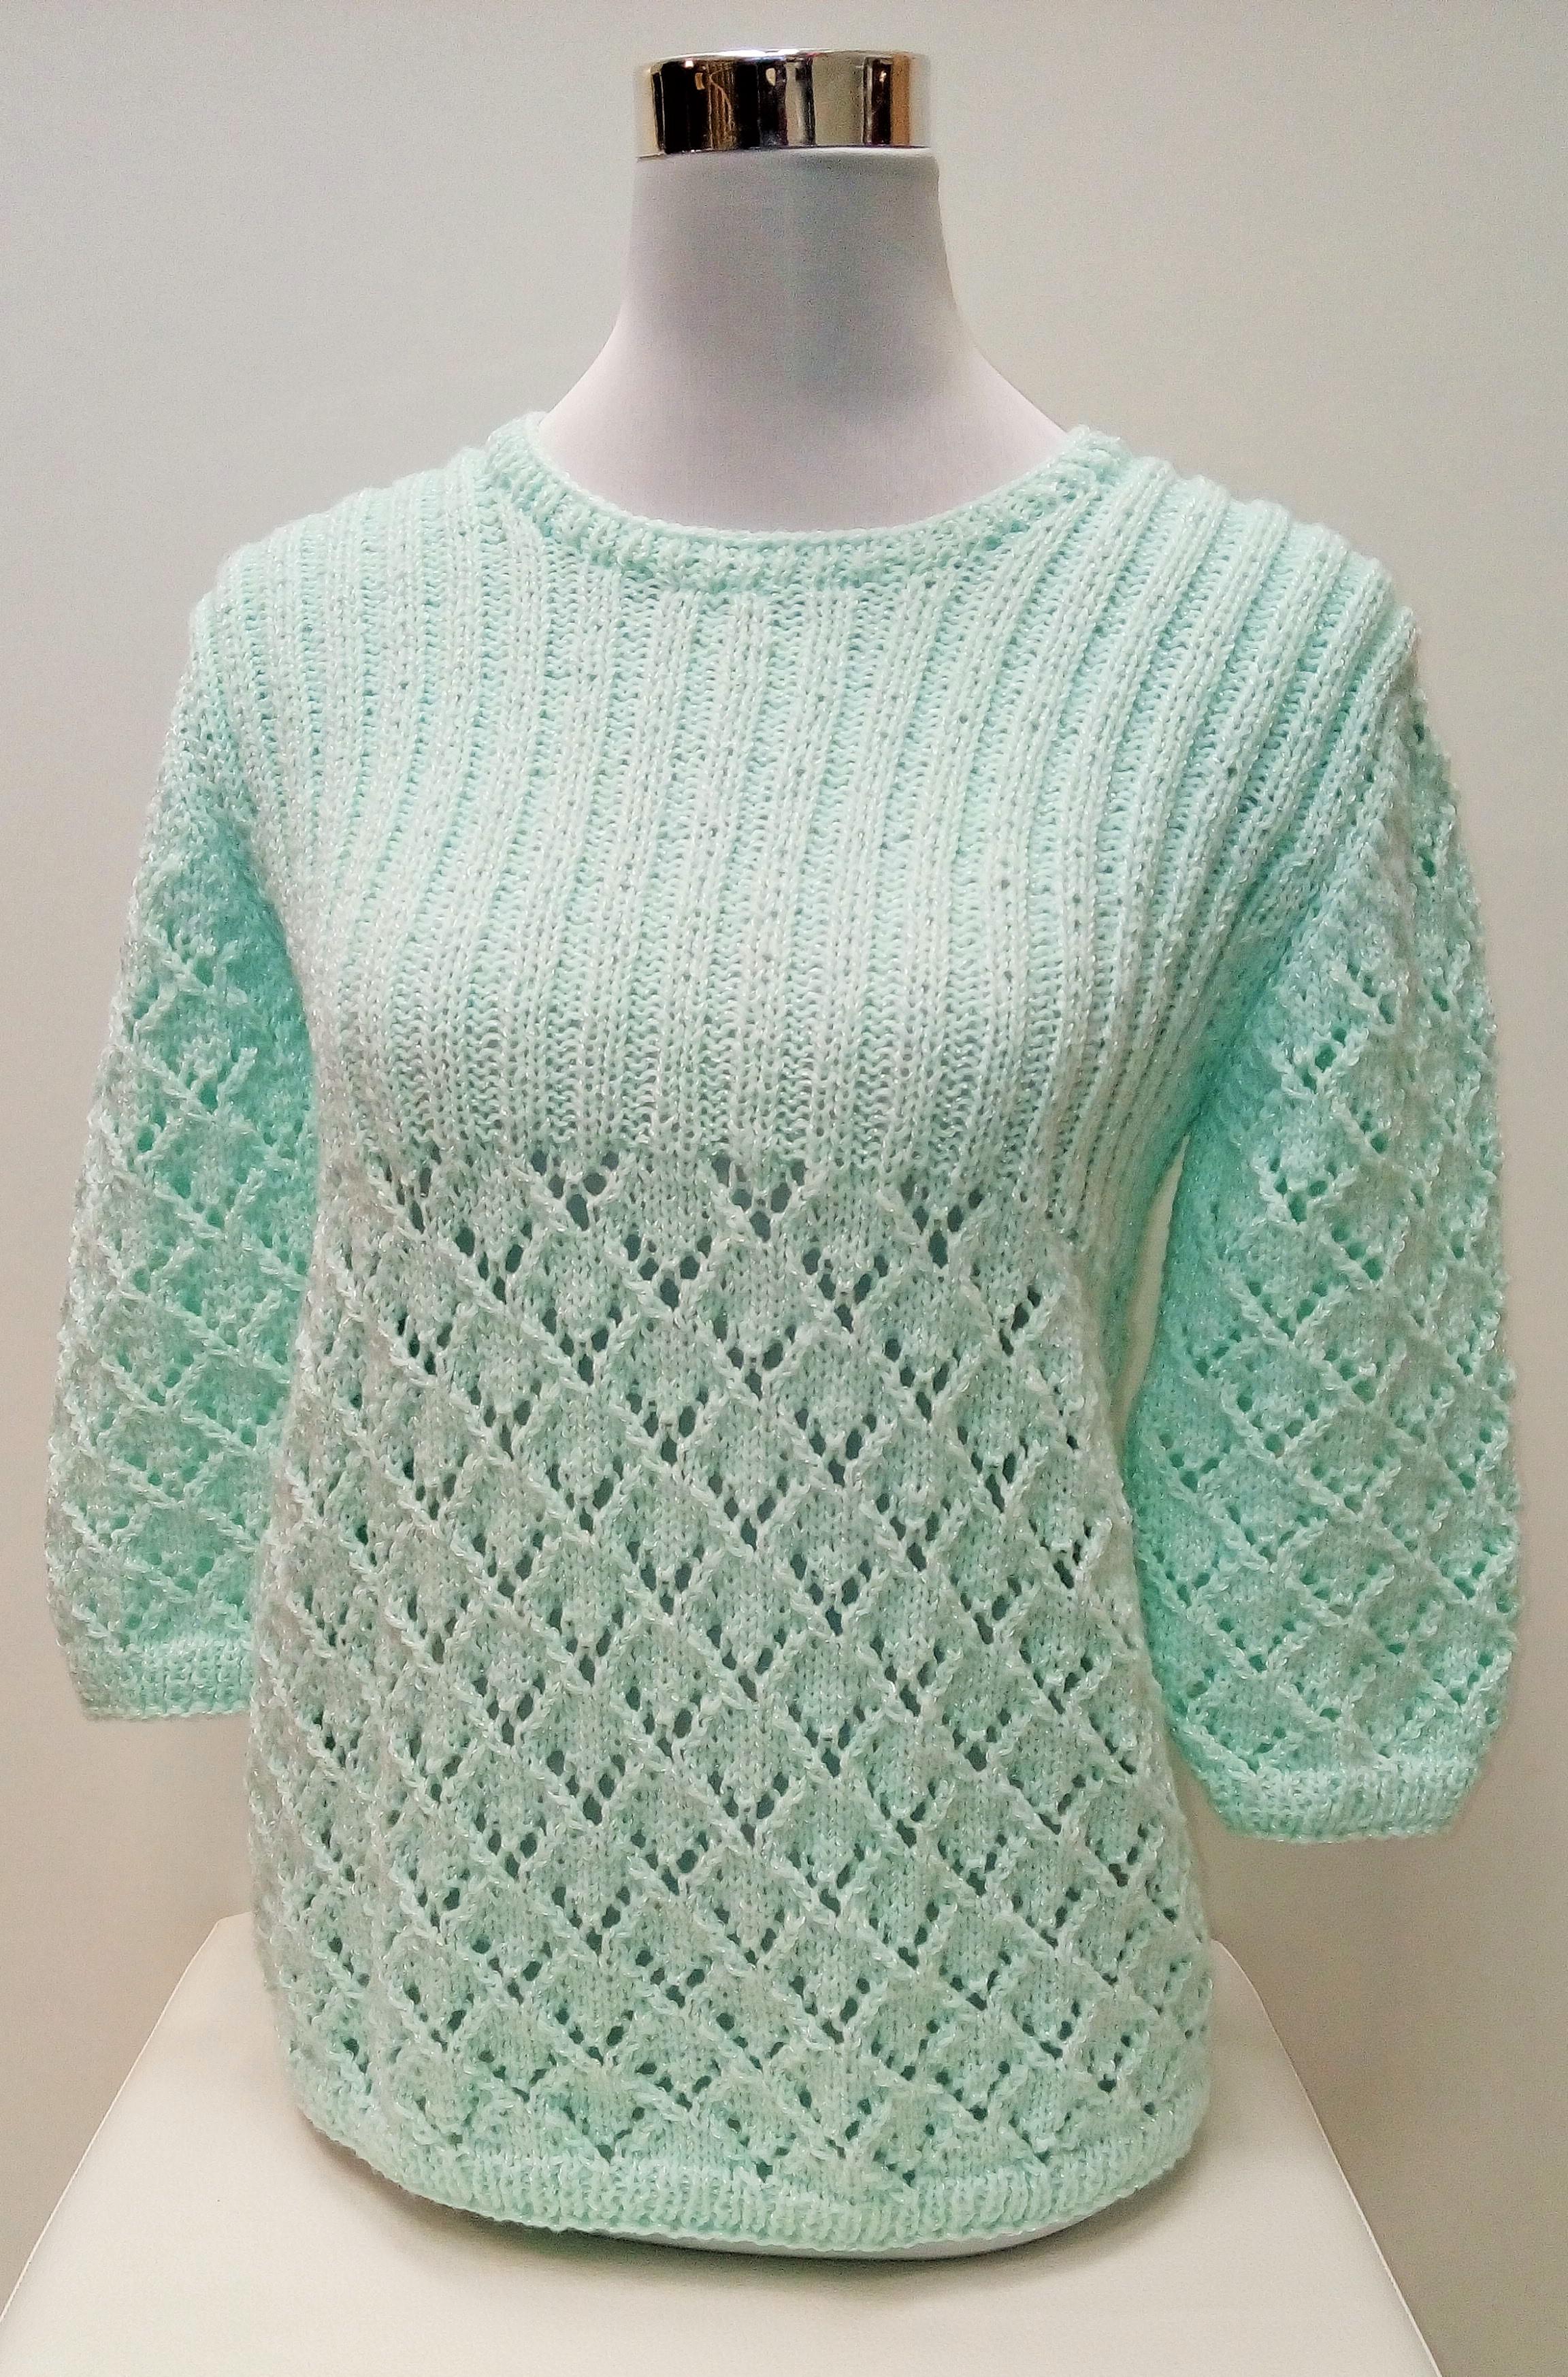 d01b0db1fa9 pletený svetr mátový IMG 20151121 164416 ...